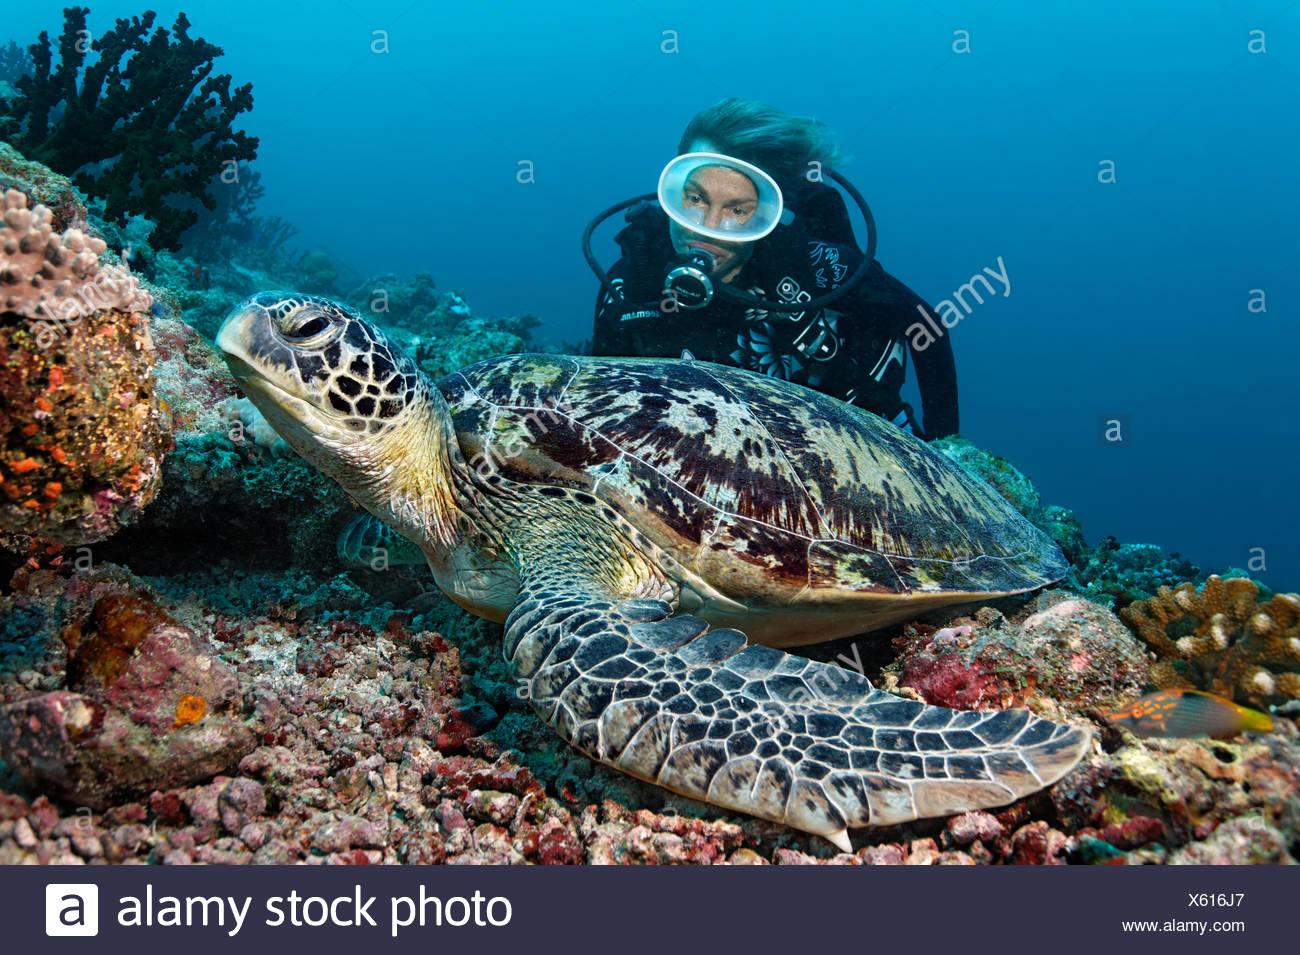 Scuba diver, Green Merress turtle (Chelonia mydas), Indian Ocean, Maldives - Stock Image